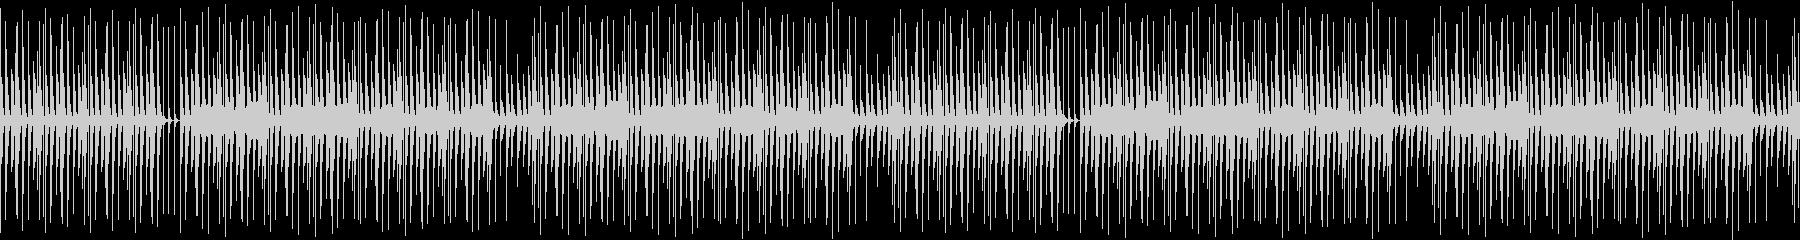 YouTube春オープニングほのぼの日常の未再生の波形